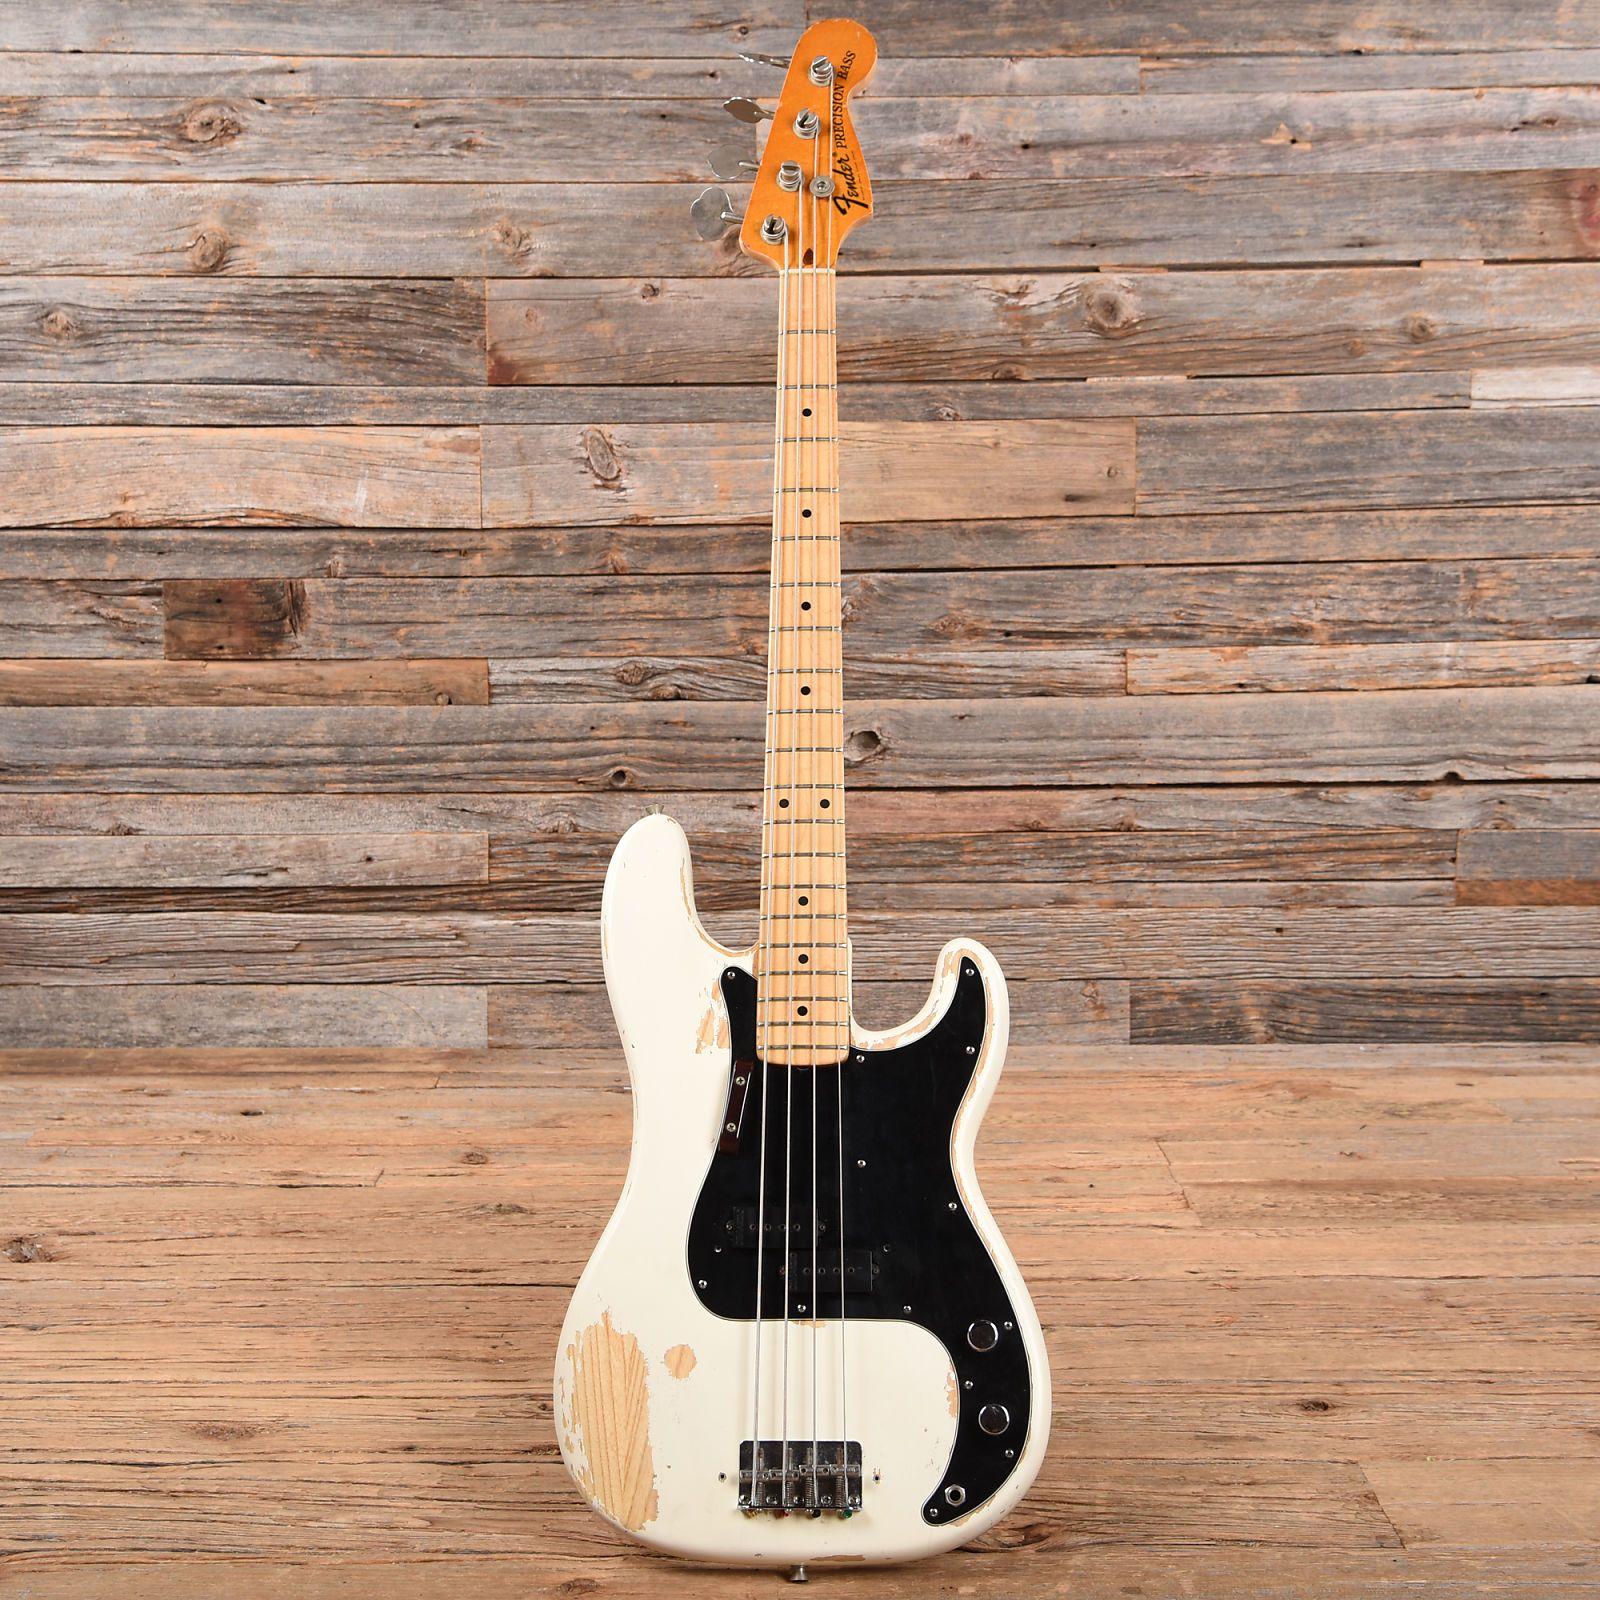 Fender Precision Bass 1970 1983 Reverb Fender Precision Bass Fender P Bass Taylor Guitars Acoustic